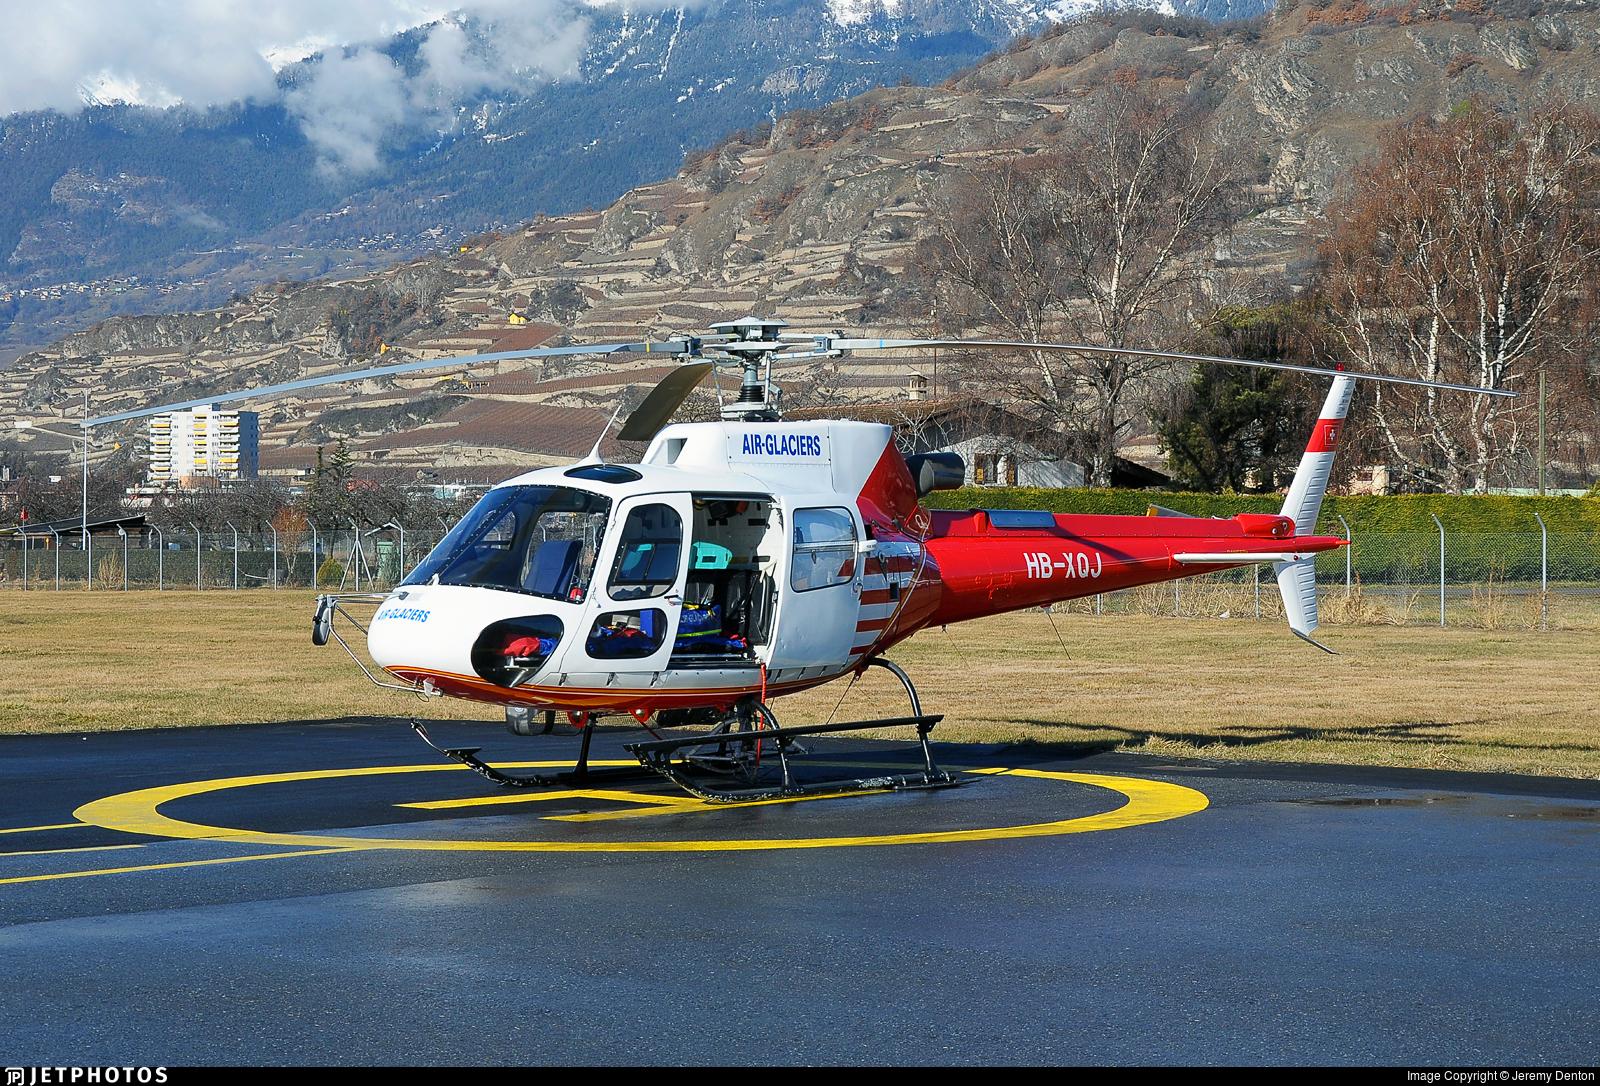 HB-XQJ - Eurocopter AS 350B3 Ecureuil - Air Glaciers (Heli-Linth)